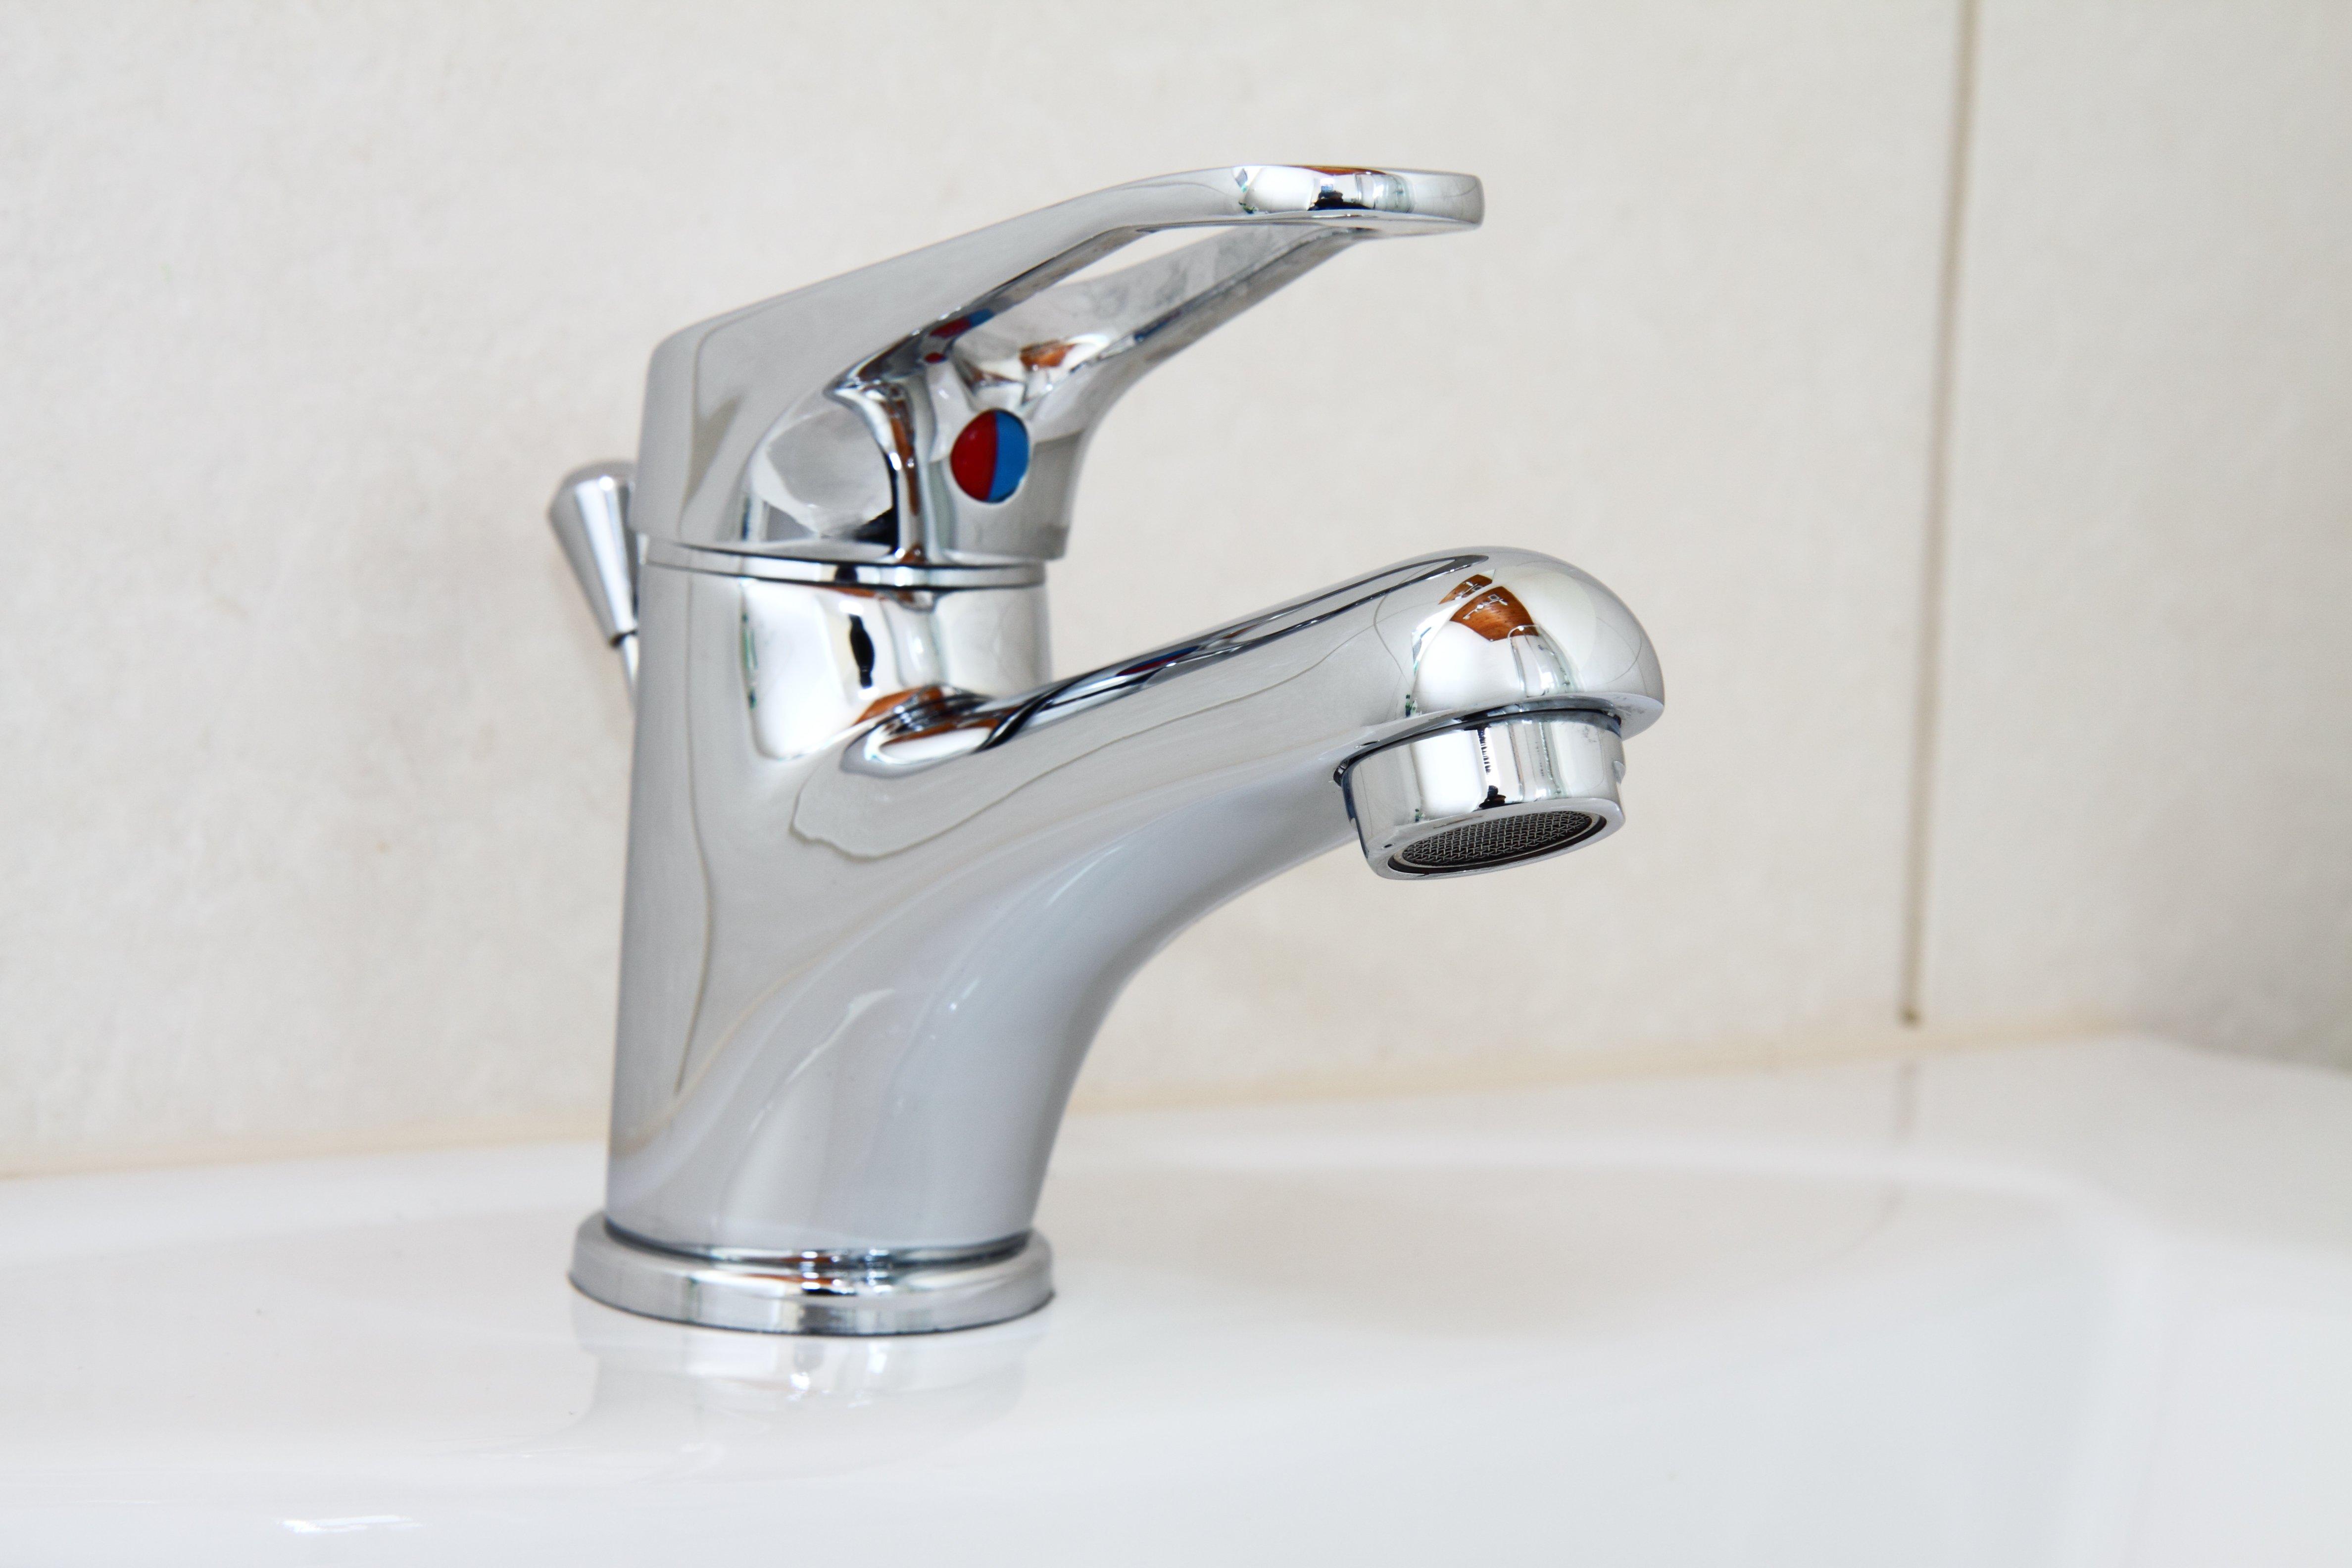 Free Images : water, white, home, steel, metal, clean, sink ...